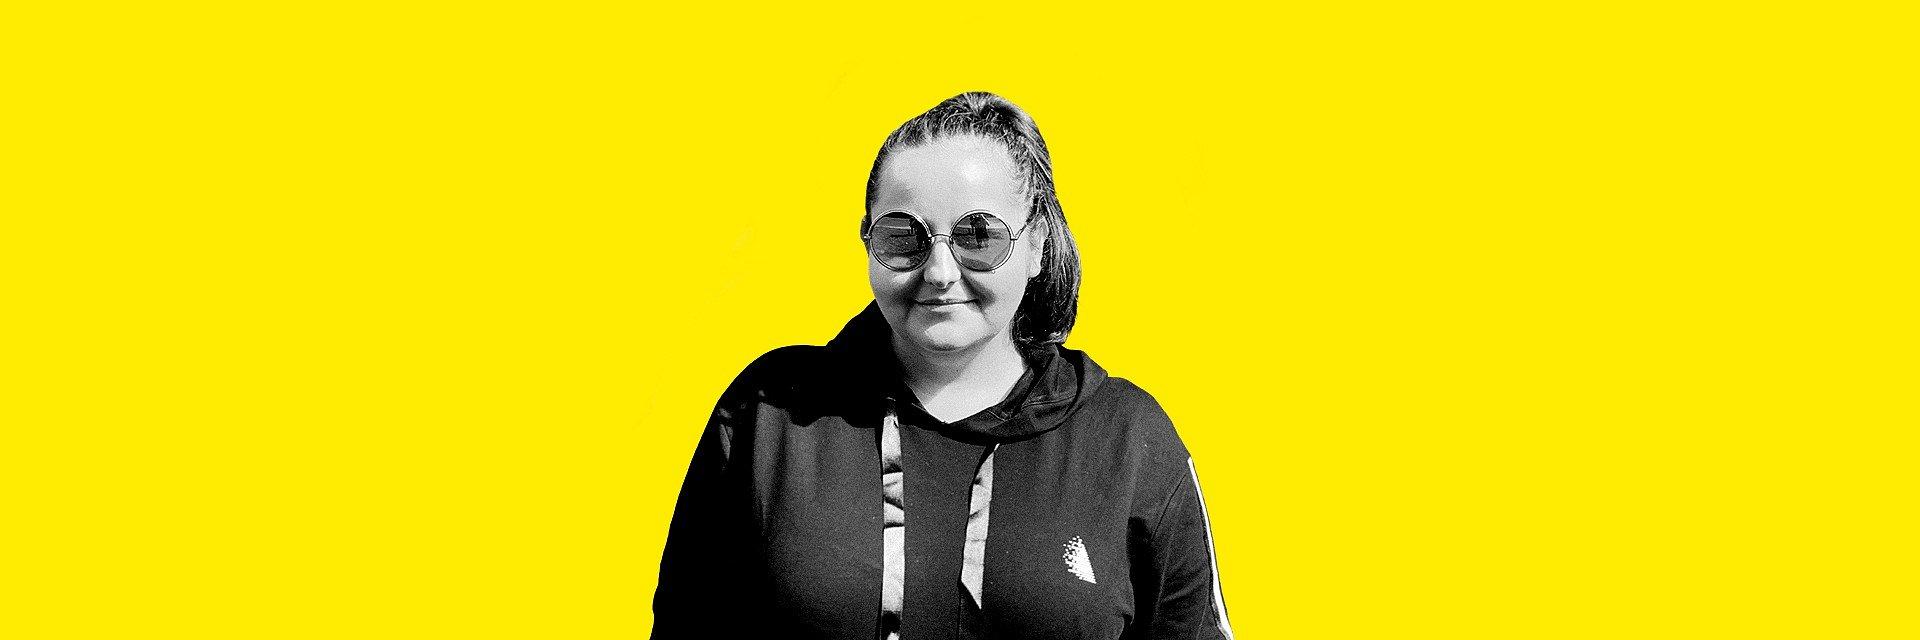 Ewa Pniak copywriterem w Scholz & Friends Warszawa (Grupa S/F)